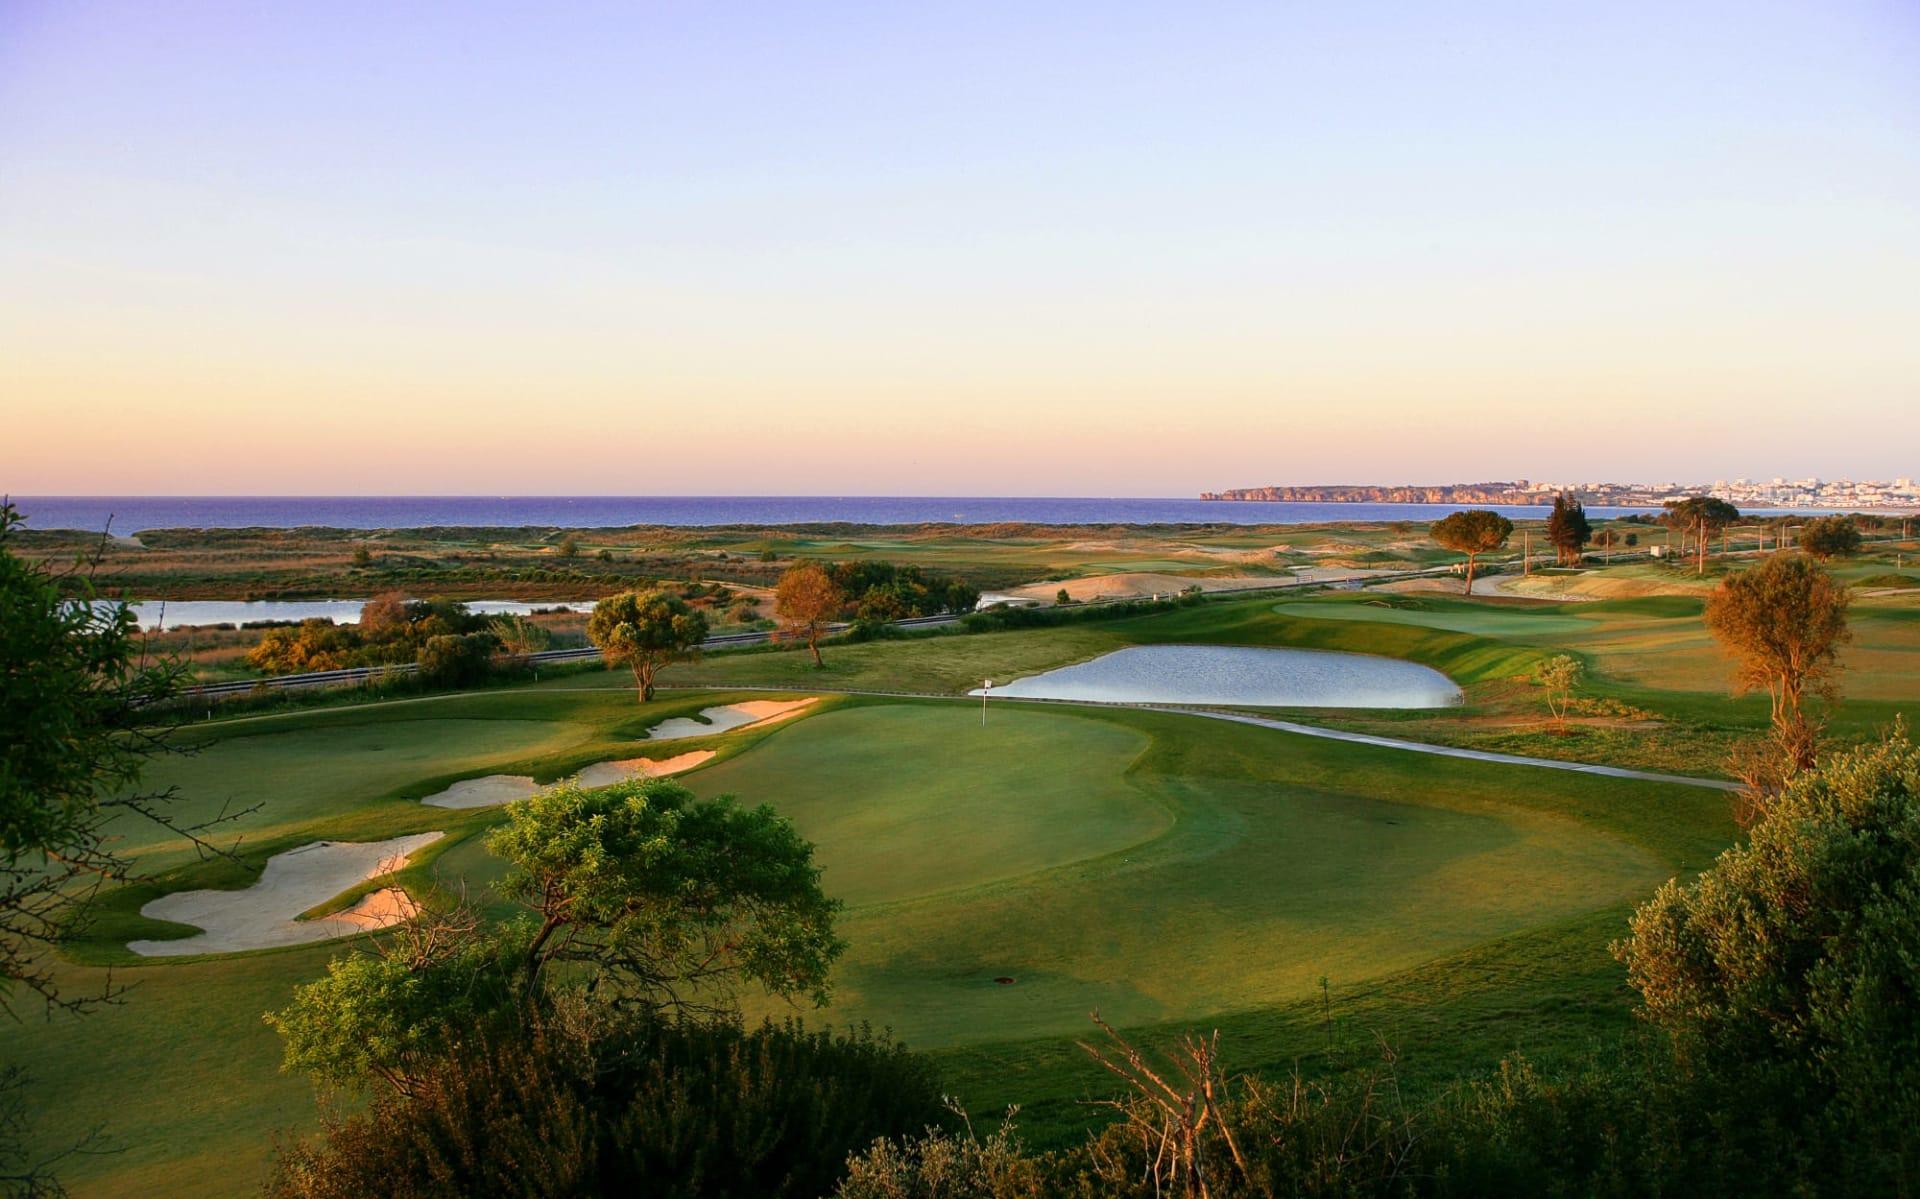 Onyria Palmares Beach & Golf Resort in Lagos:  Lagos #13 green